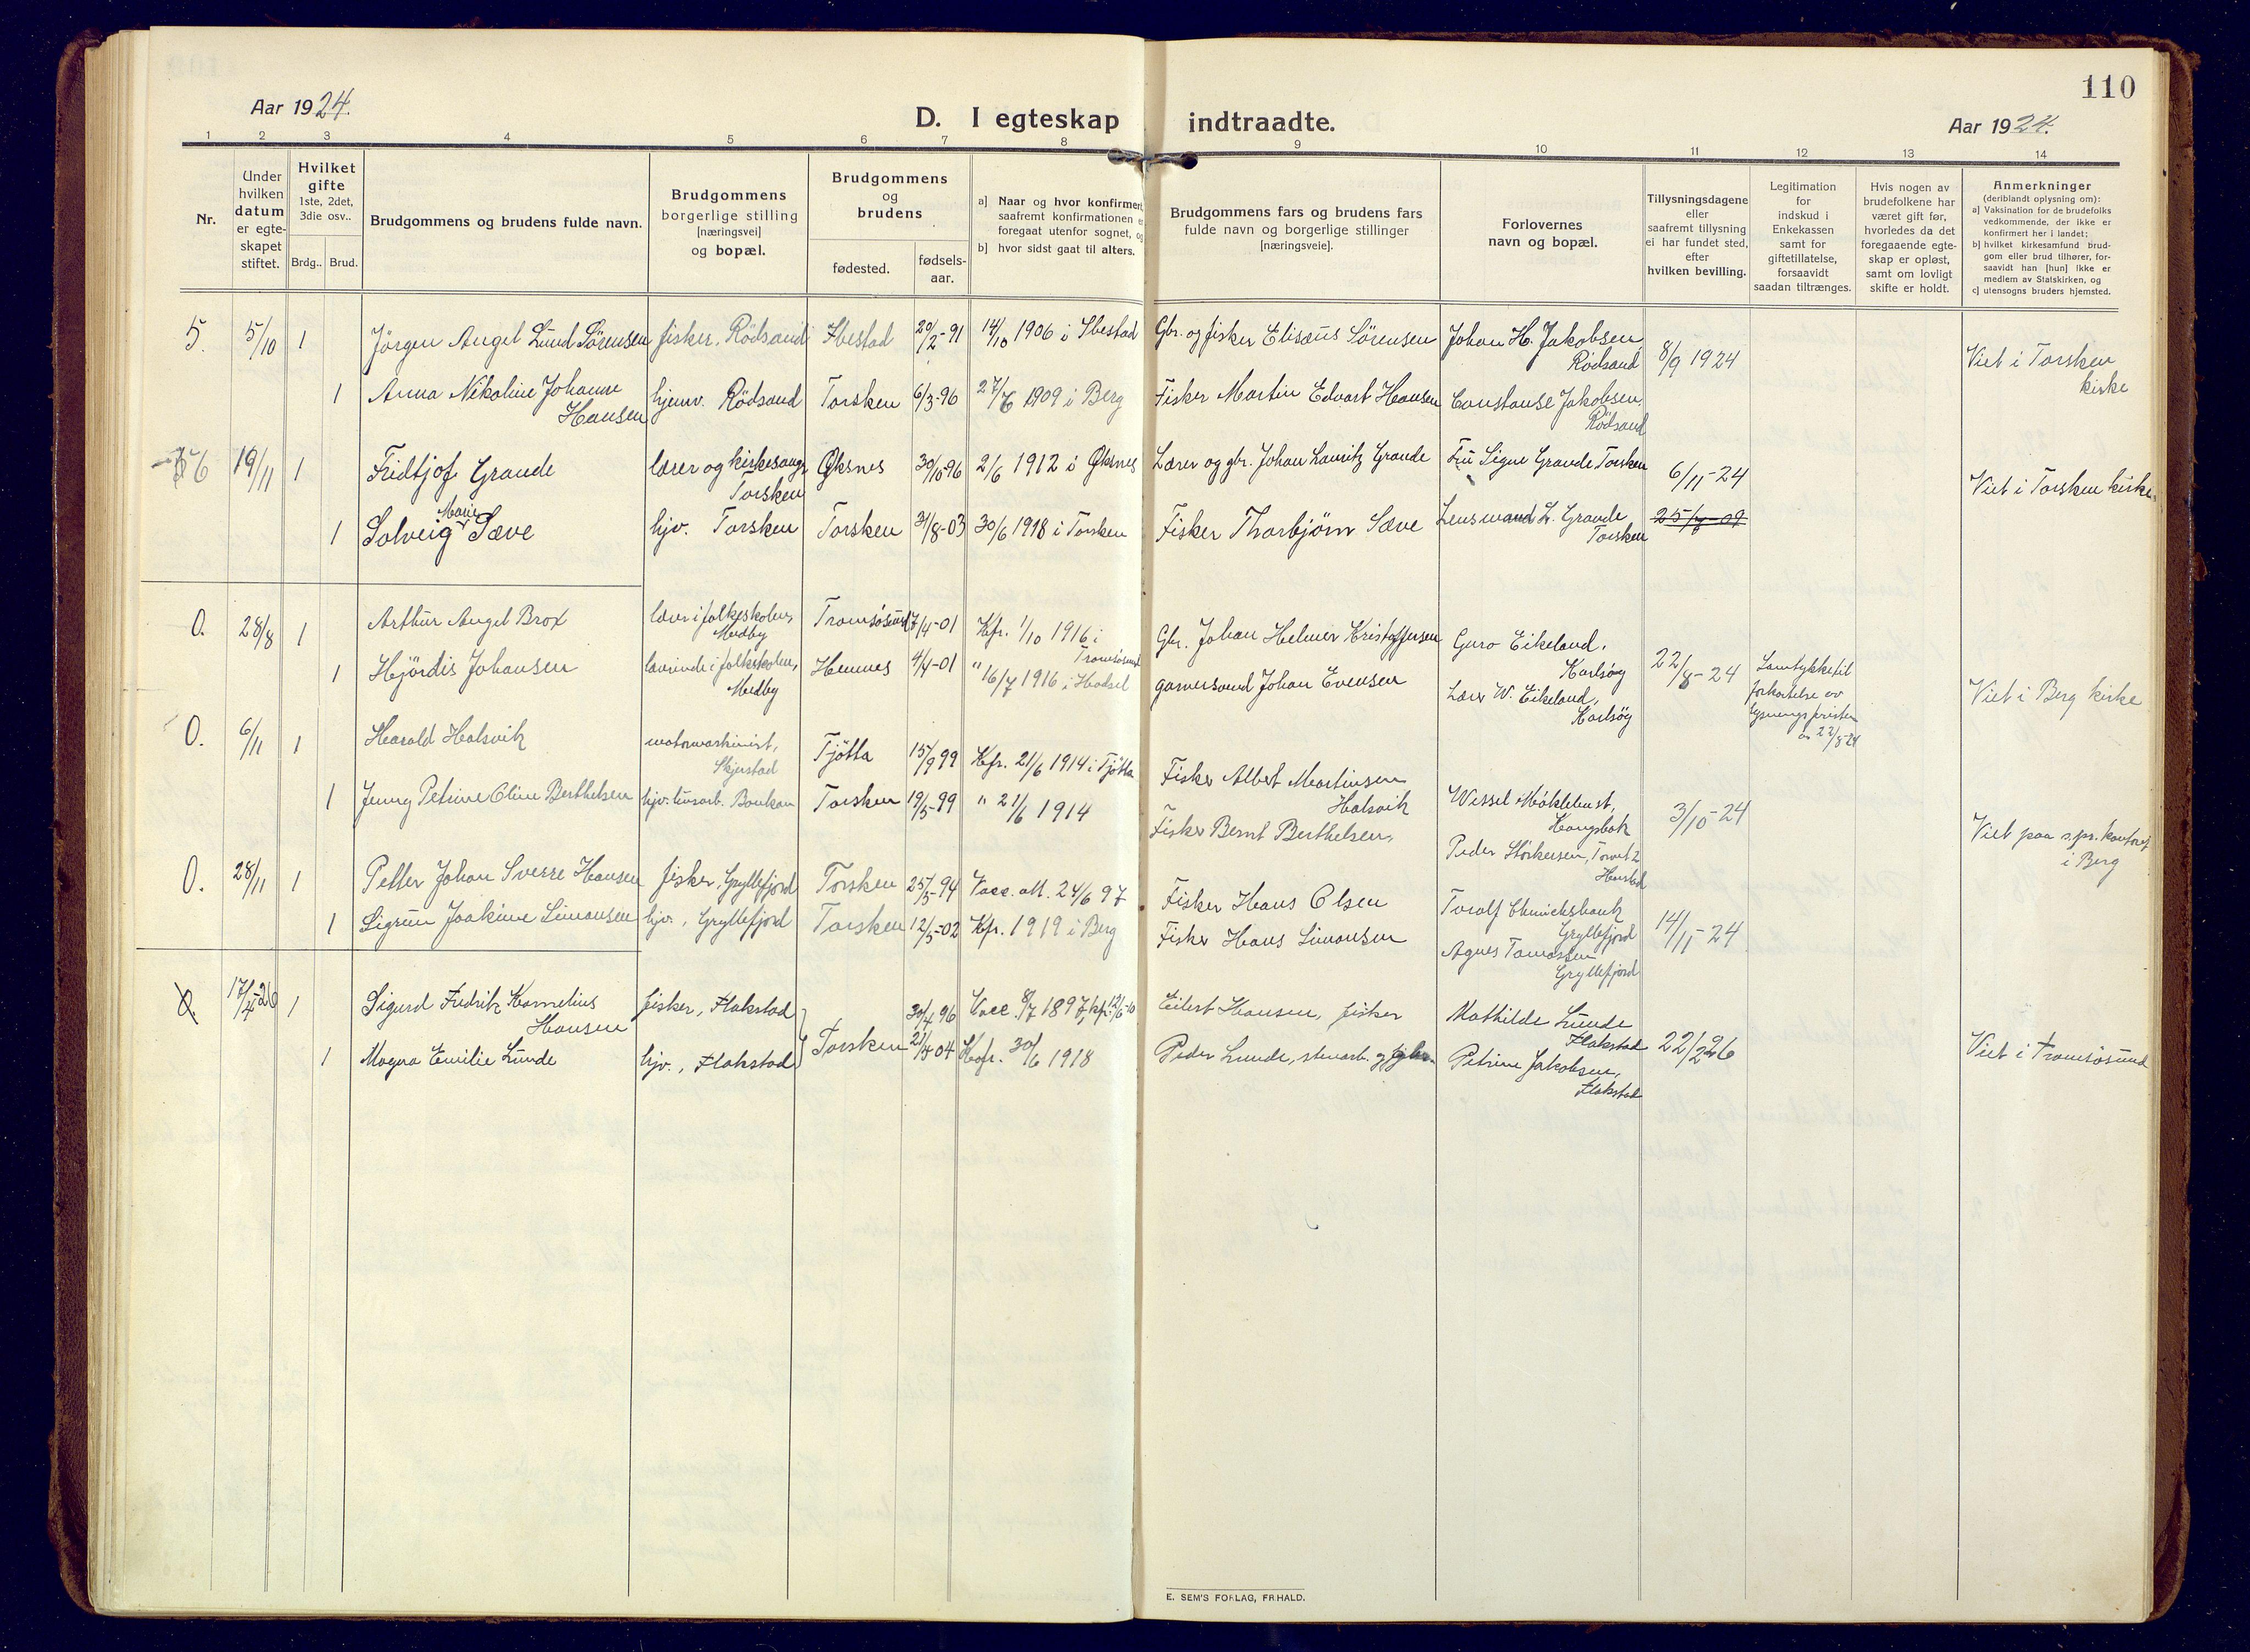 SATØ, Mefjord/Berg sokneprestkontor, G/Ga/Gaa: Ministerialbok nr. 10, 1916-1928, s. 110